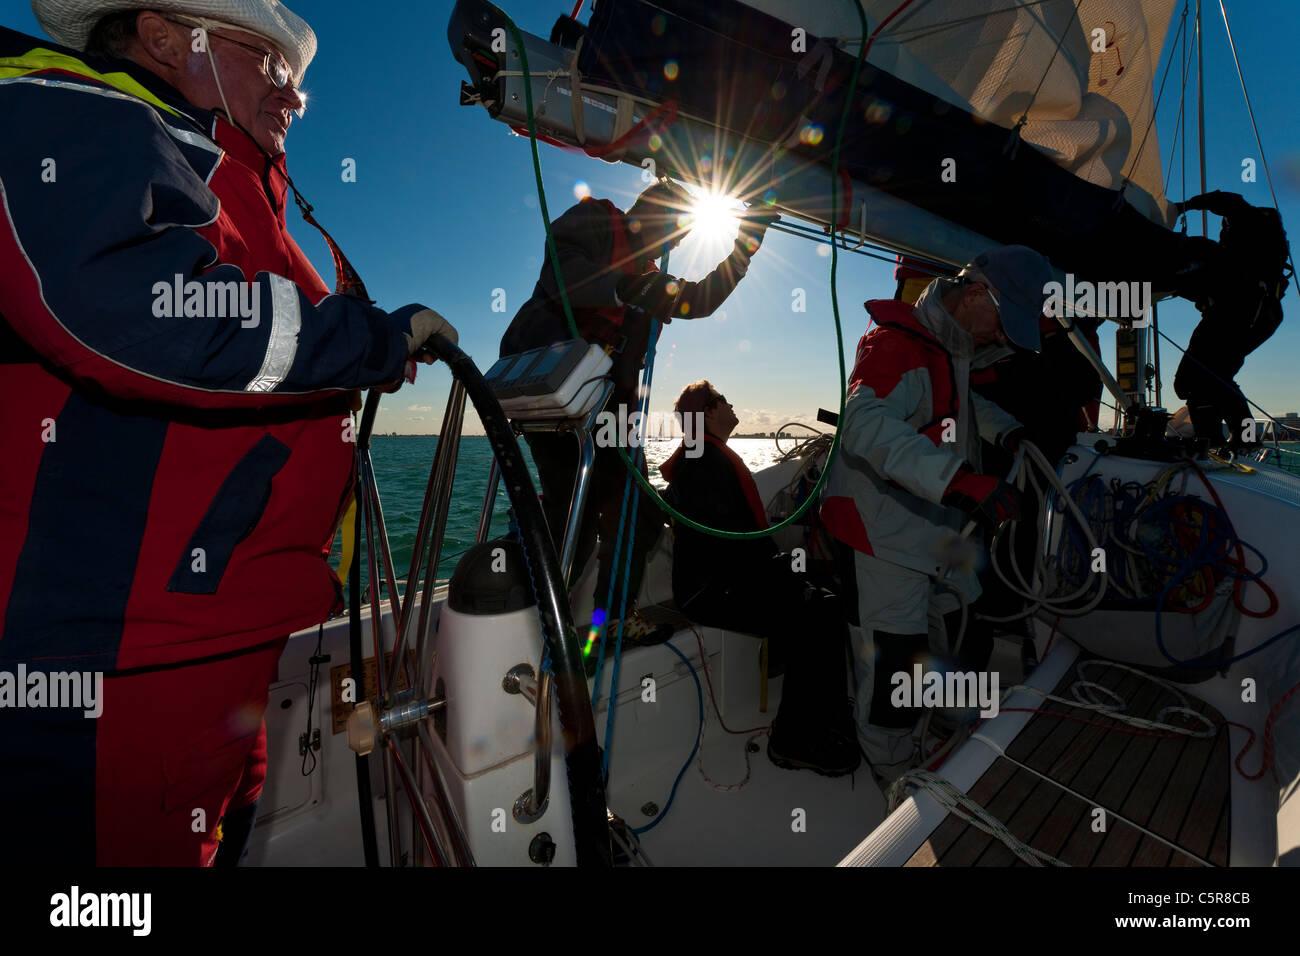 Kapitän am Steuer des Ozean-Yacht mit Crew arbeiten. Stockbild